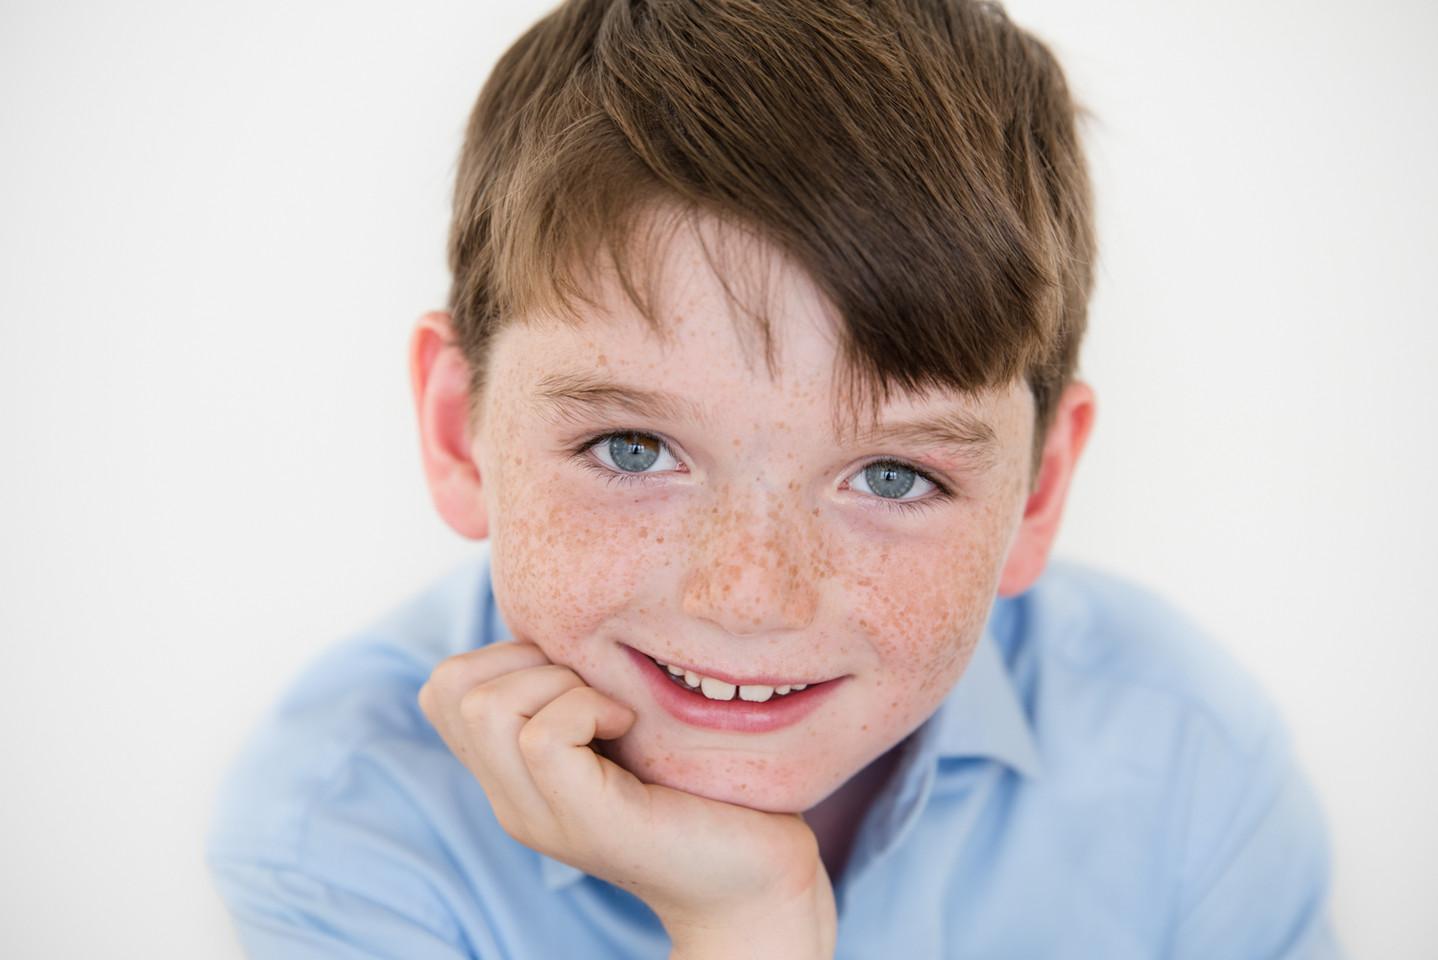 Rye NY New York Jo Bryan JoBryan photo photography solo young boy studio natural light blue eyes brown hair blue shirt smiling